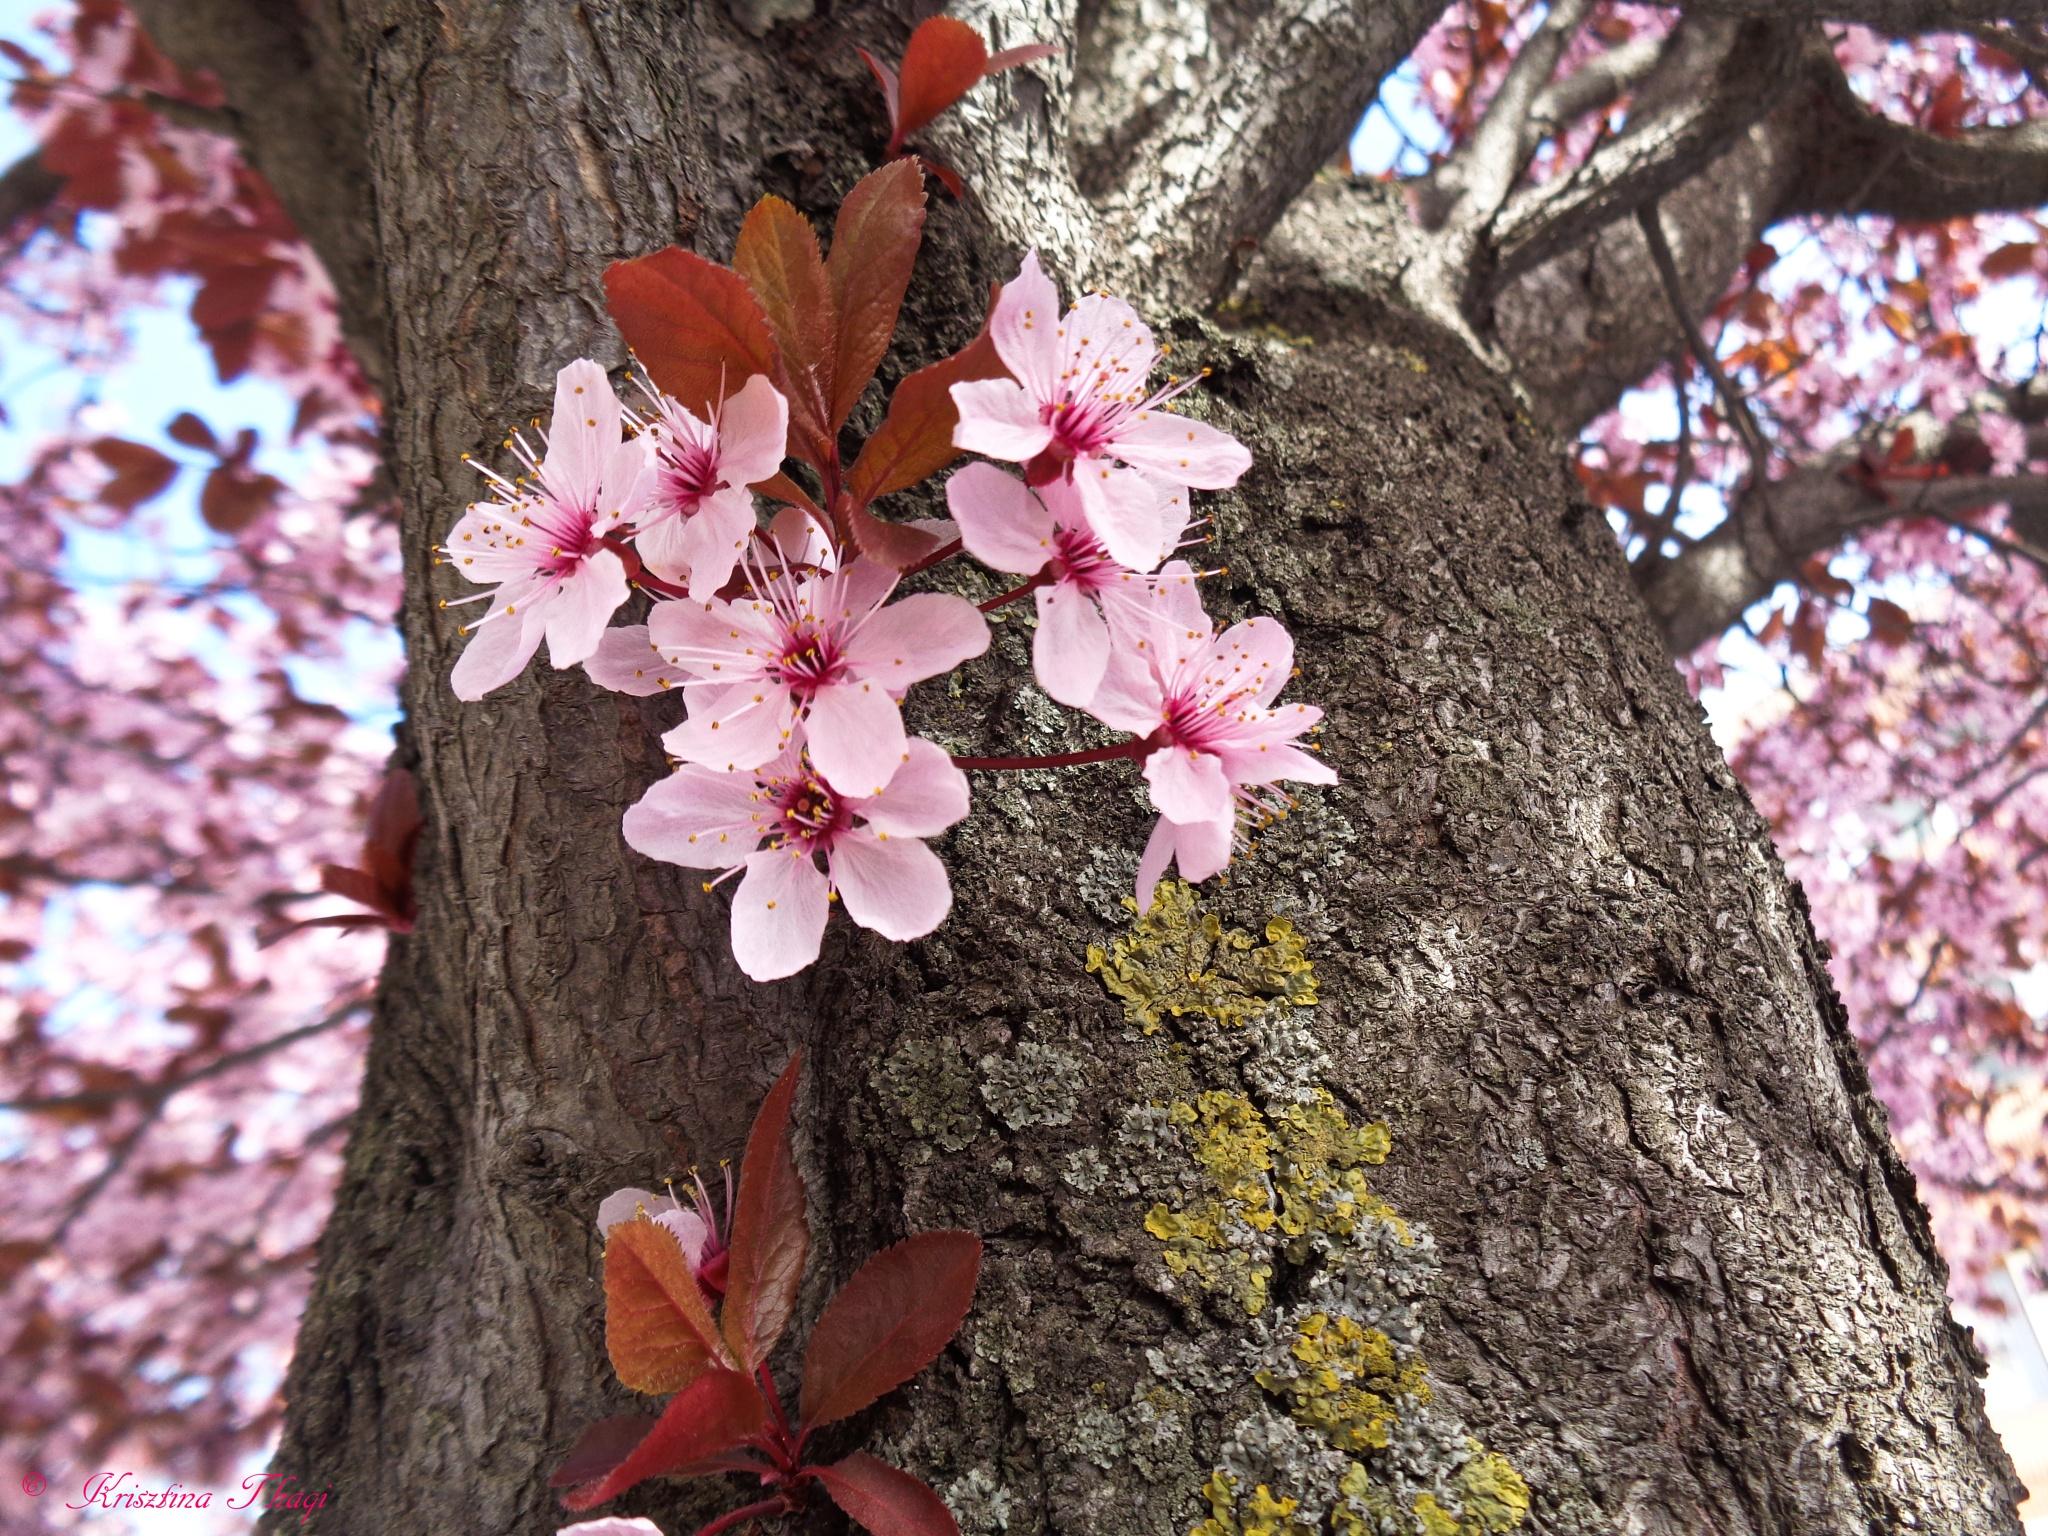 Cherry blossom by Krisztina Thaqi